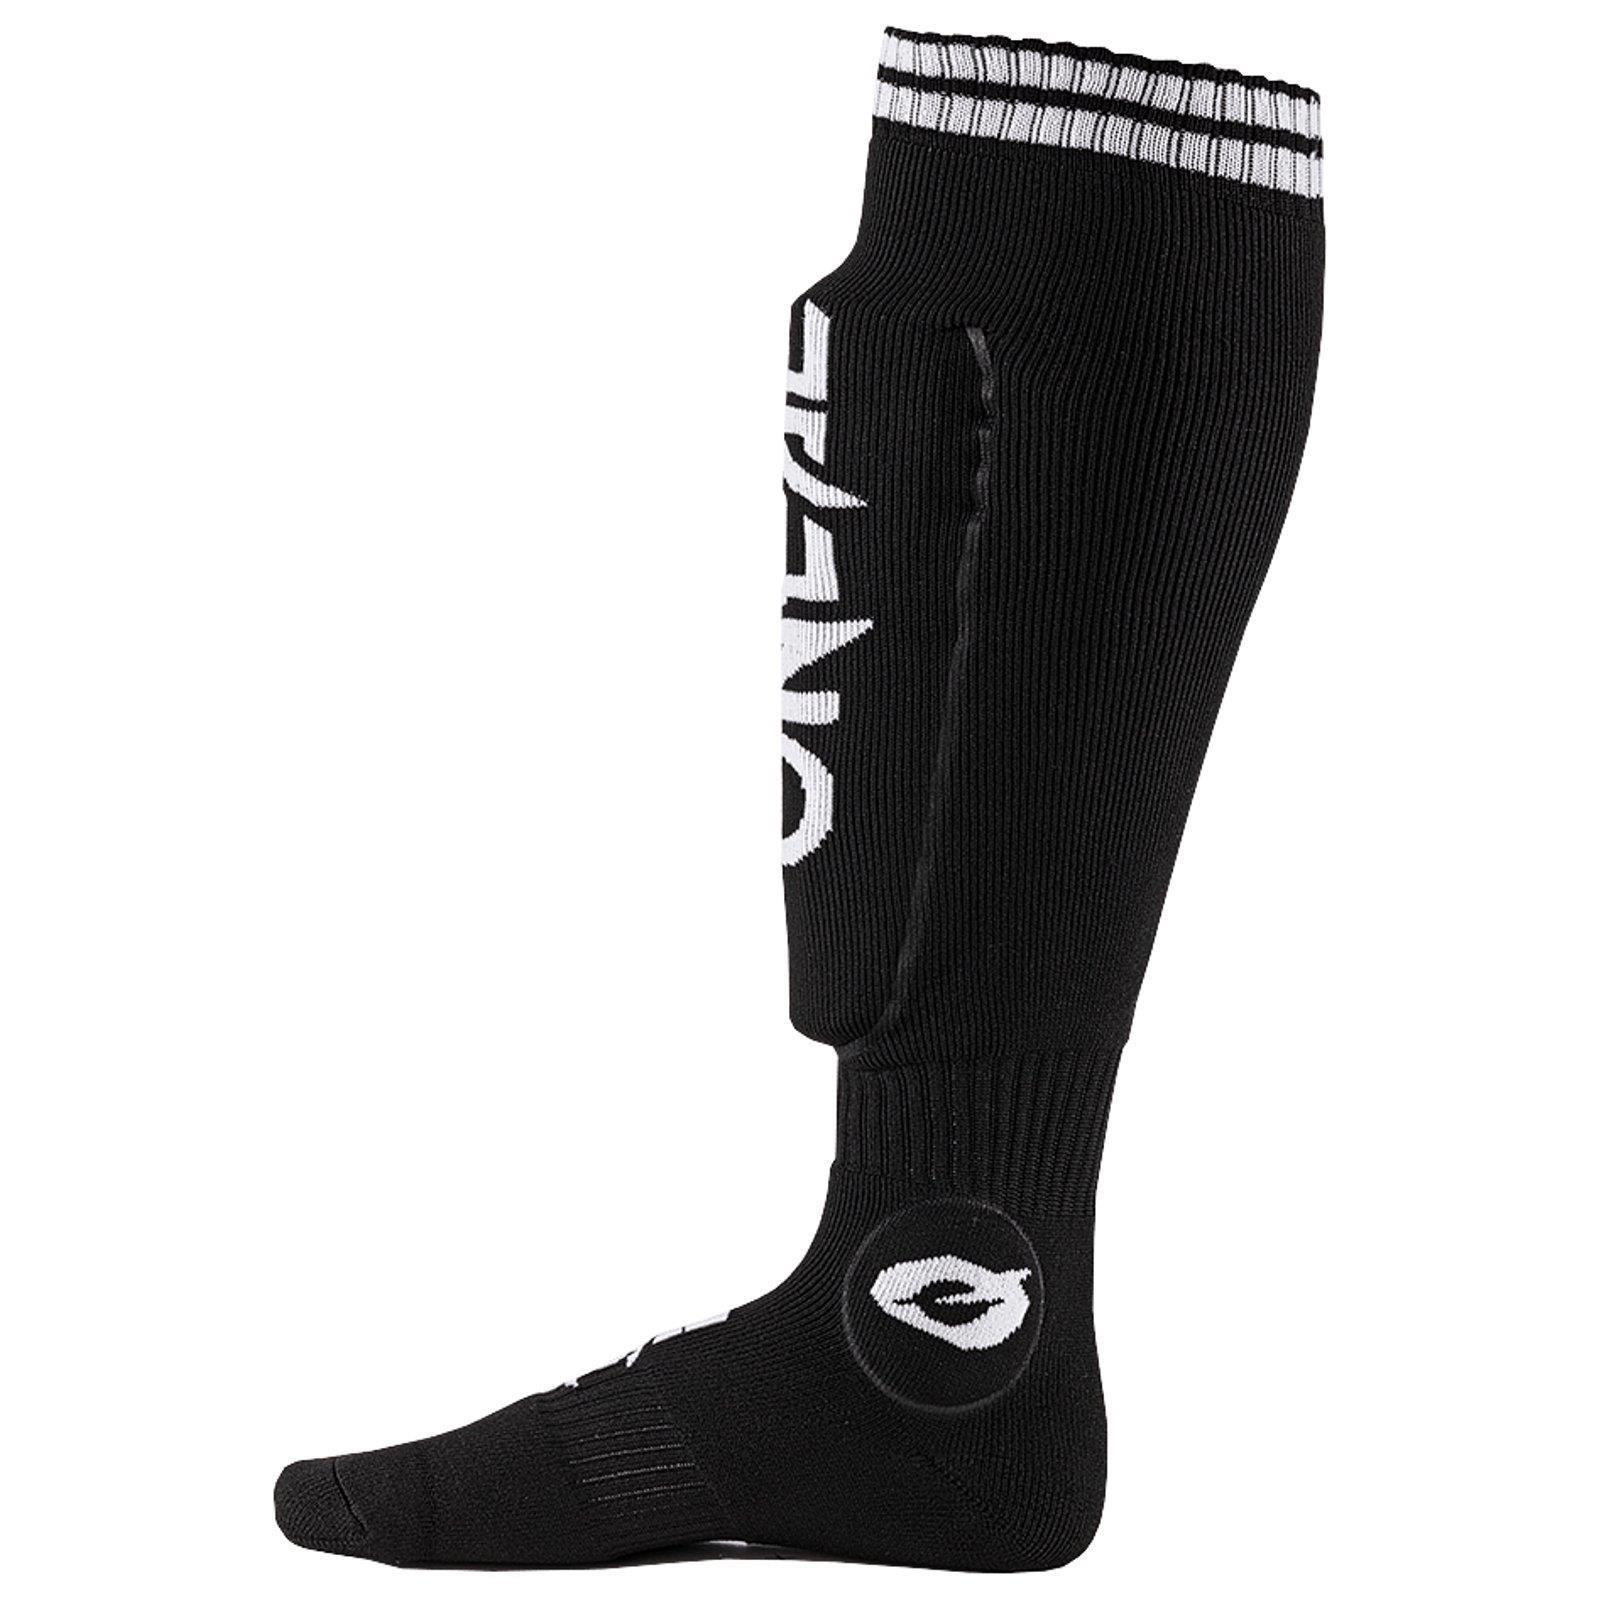 ONEAL-MOTO-CROSS-Calze-Moto-Enduro-MX-MTB-ATV-Quad-Calze-Sock-BICICLETTA-FR miniatura 69